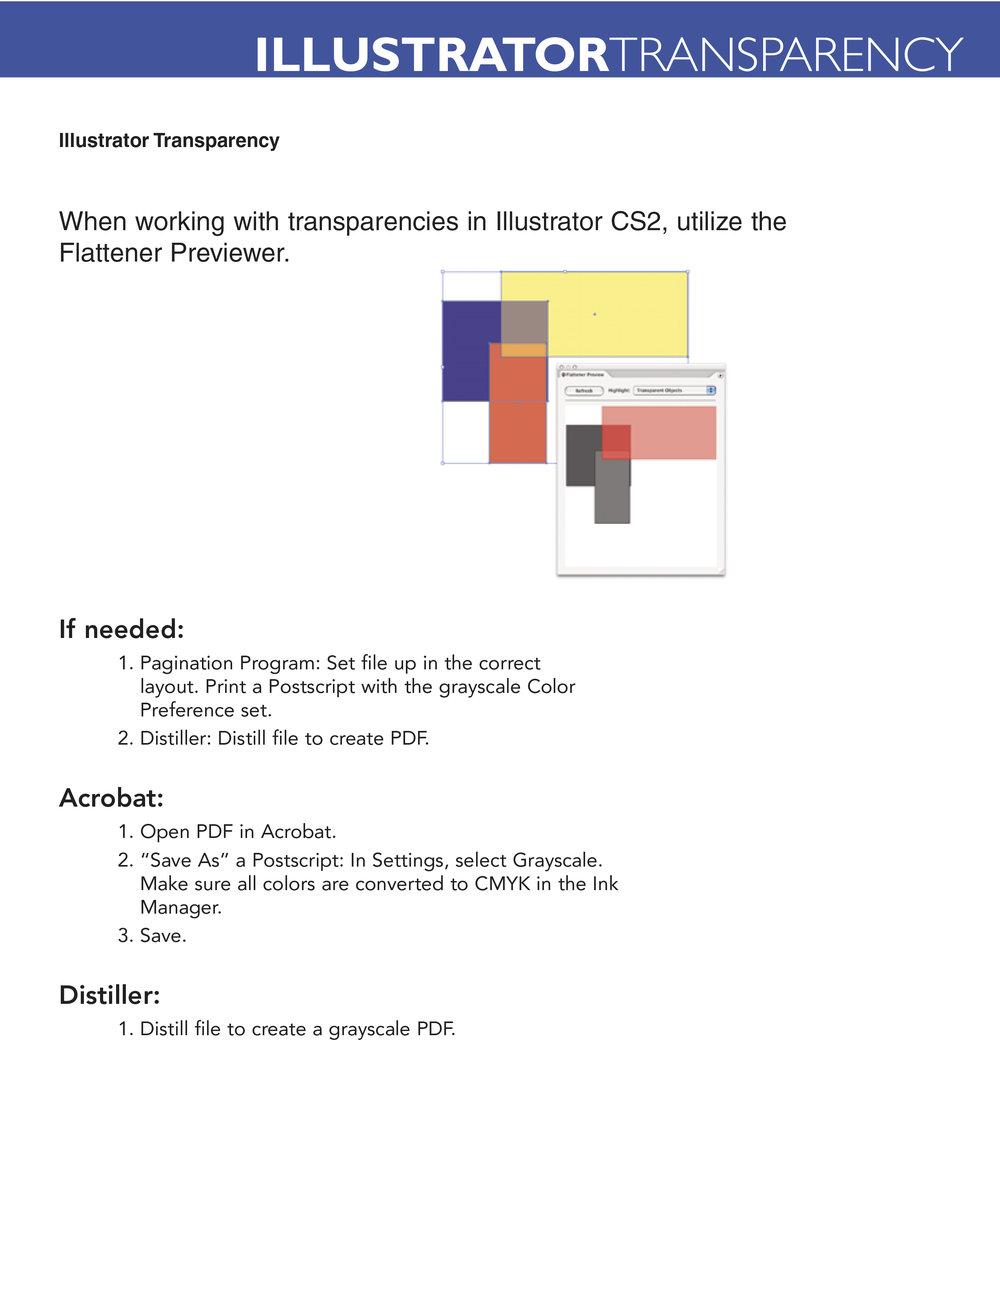 WorkingWithIllTransparency_000.jpg